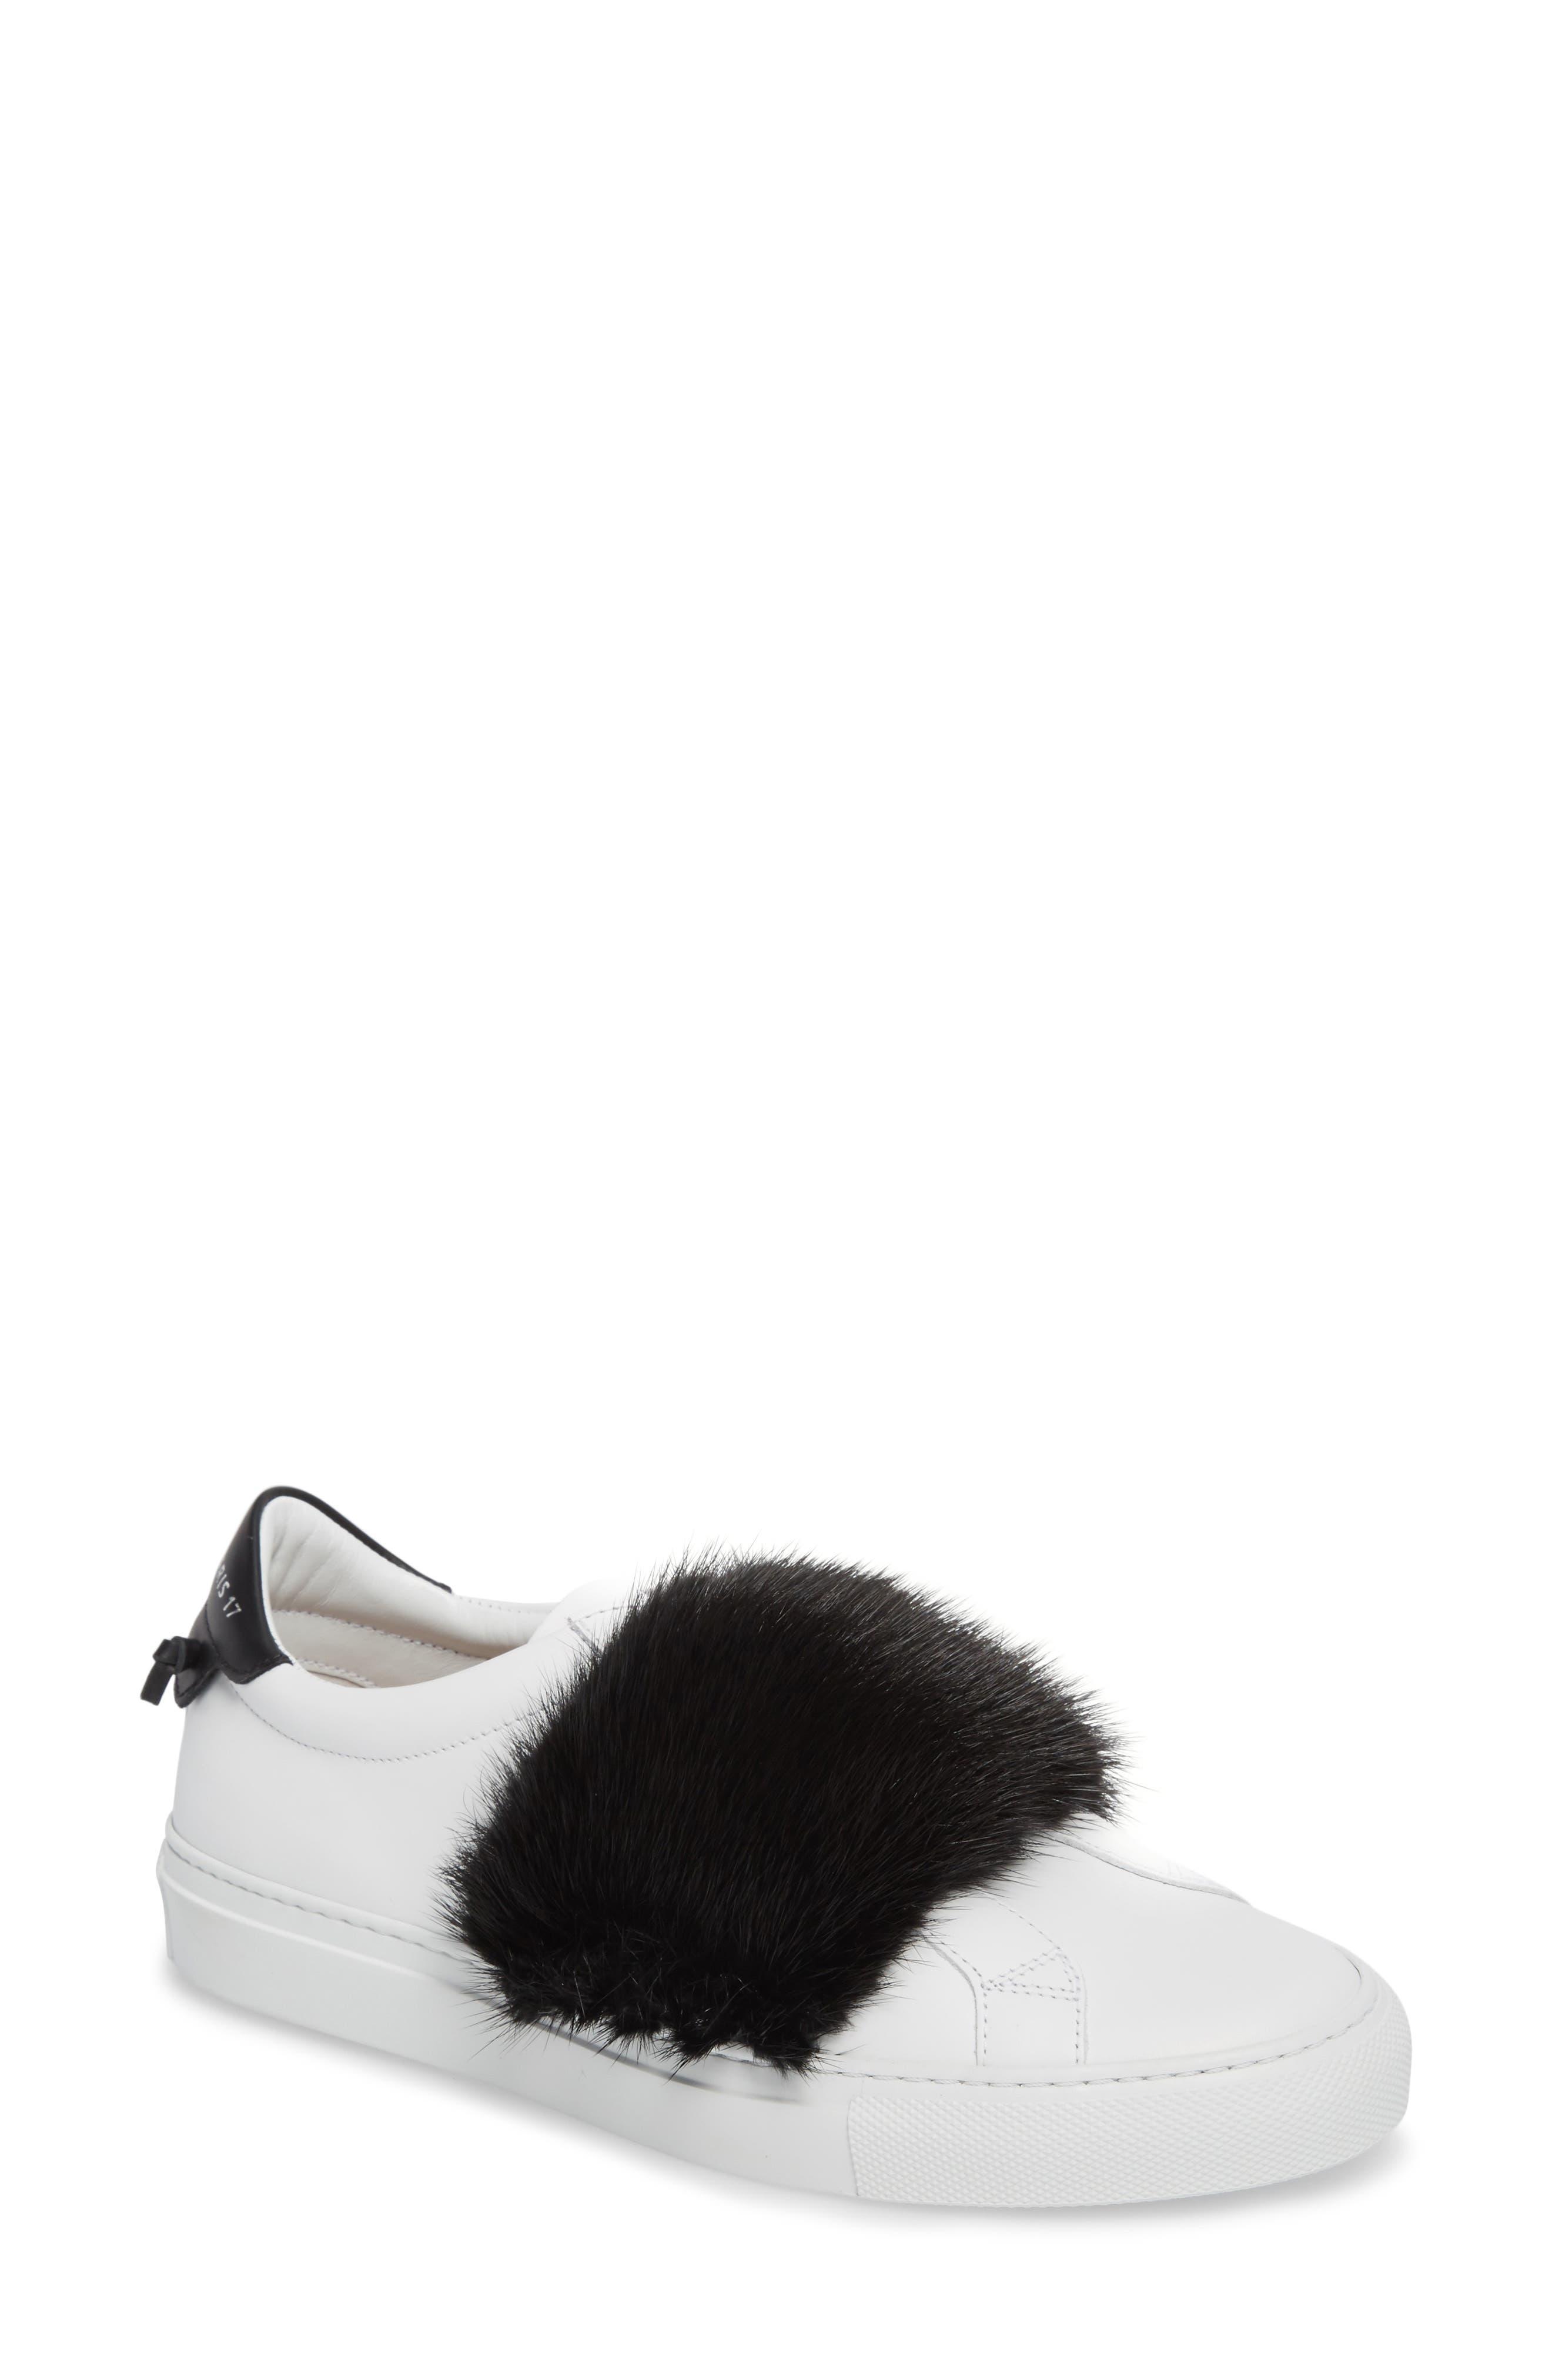 Urban Street Slip-On Sneaker with Genuine Mink Fur Trim,                         Main,                         color,